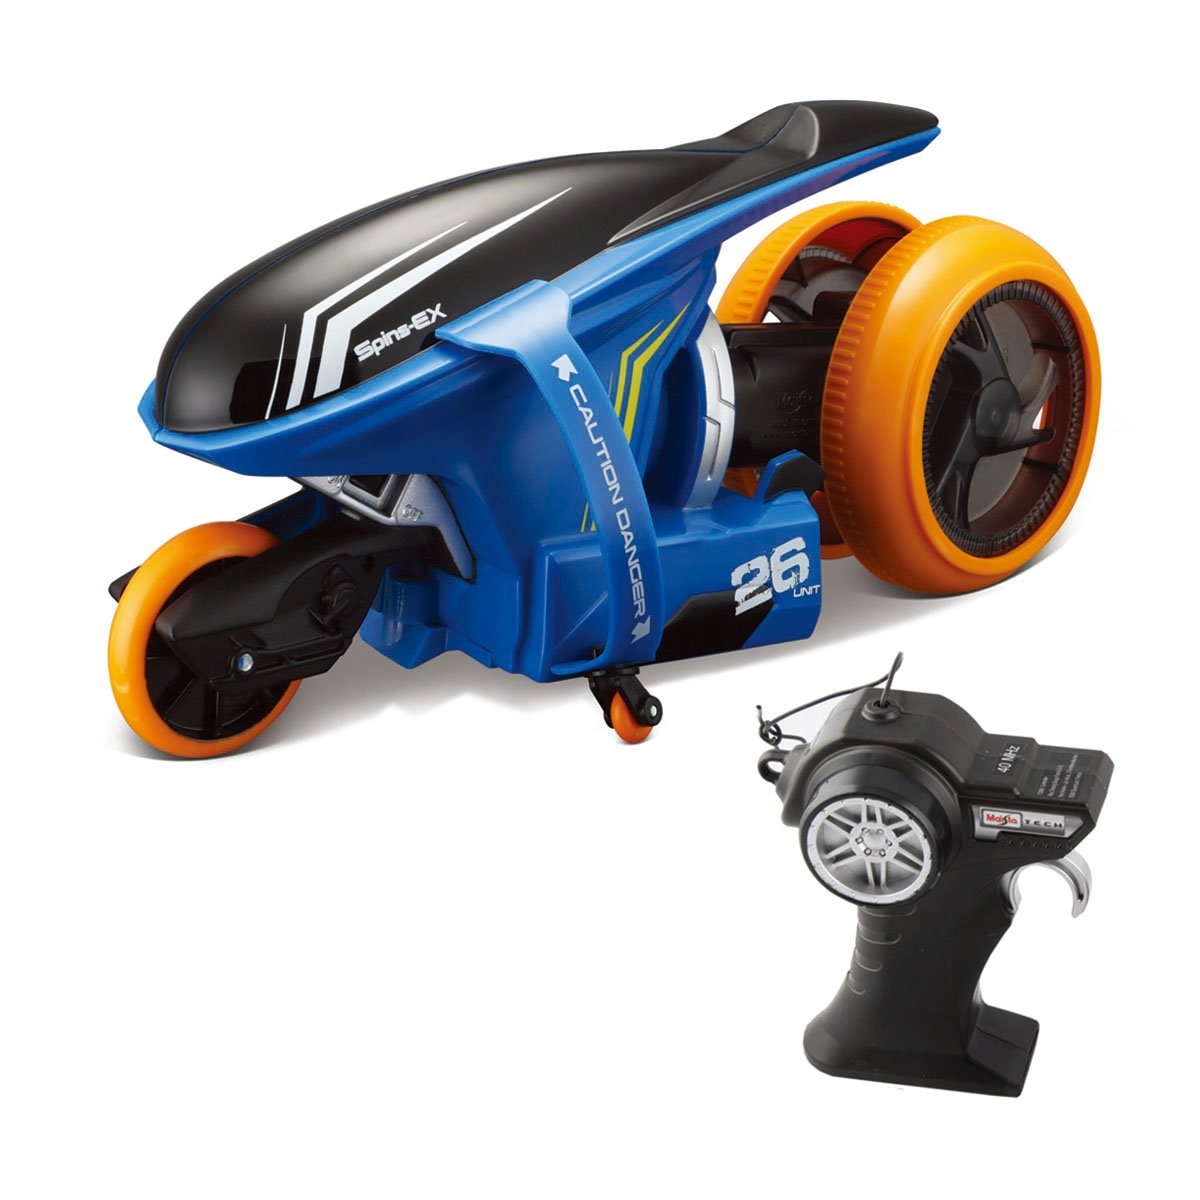 Motocicleta cu telecomanda Cyklone 360 Maisto, Albastru, 27 MHz